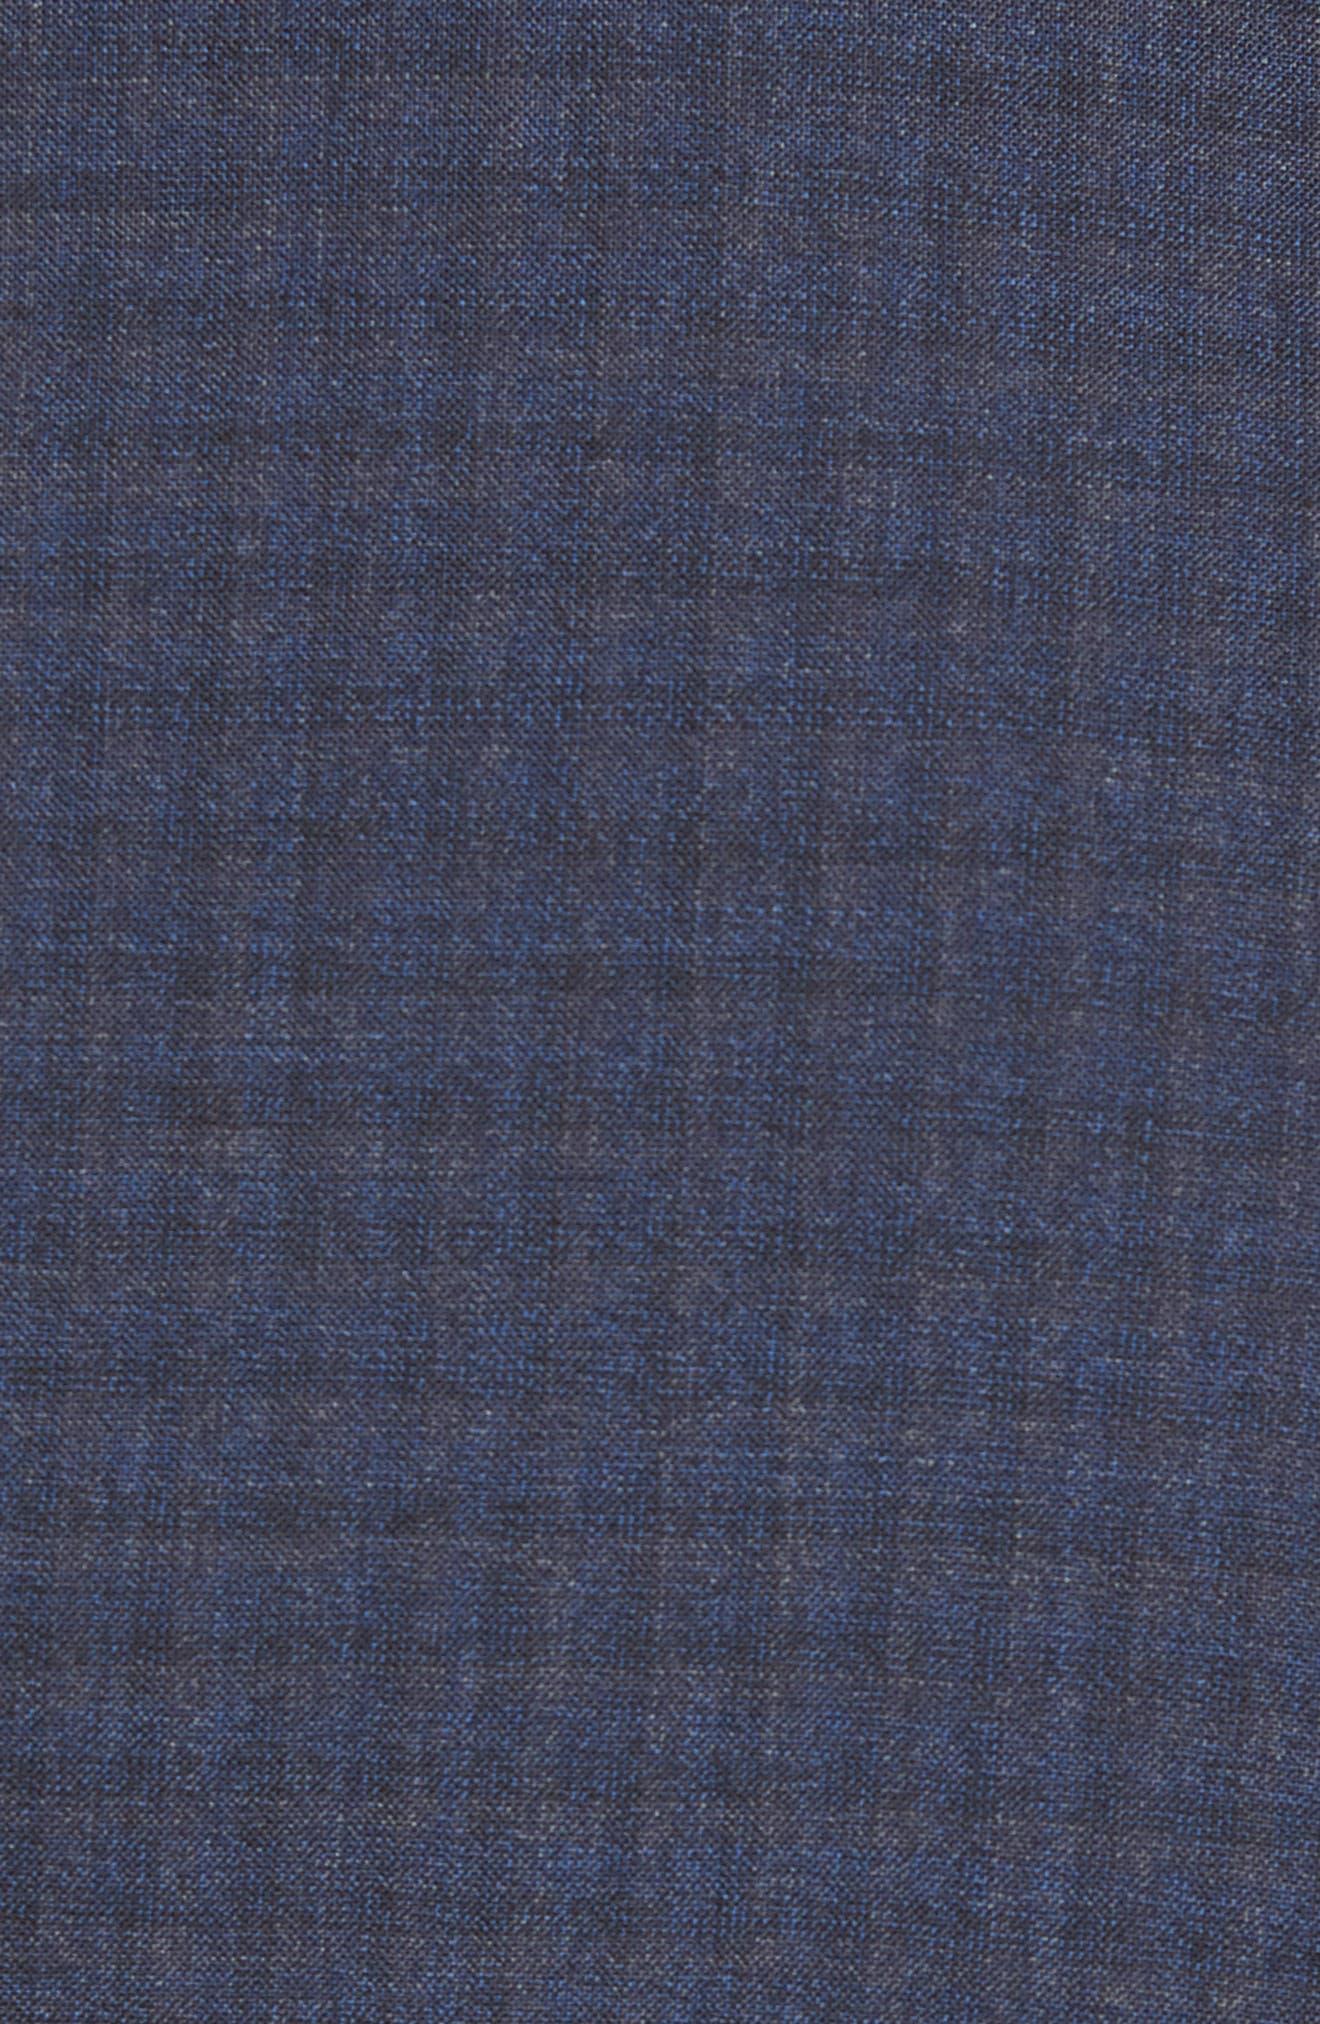 Huge/Genius Trim Fit Check Wool Suit,                             Alternate thumbnail 7, color,                             Blue/ Brown/ Charcoal